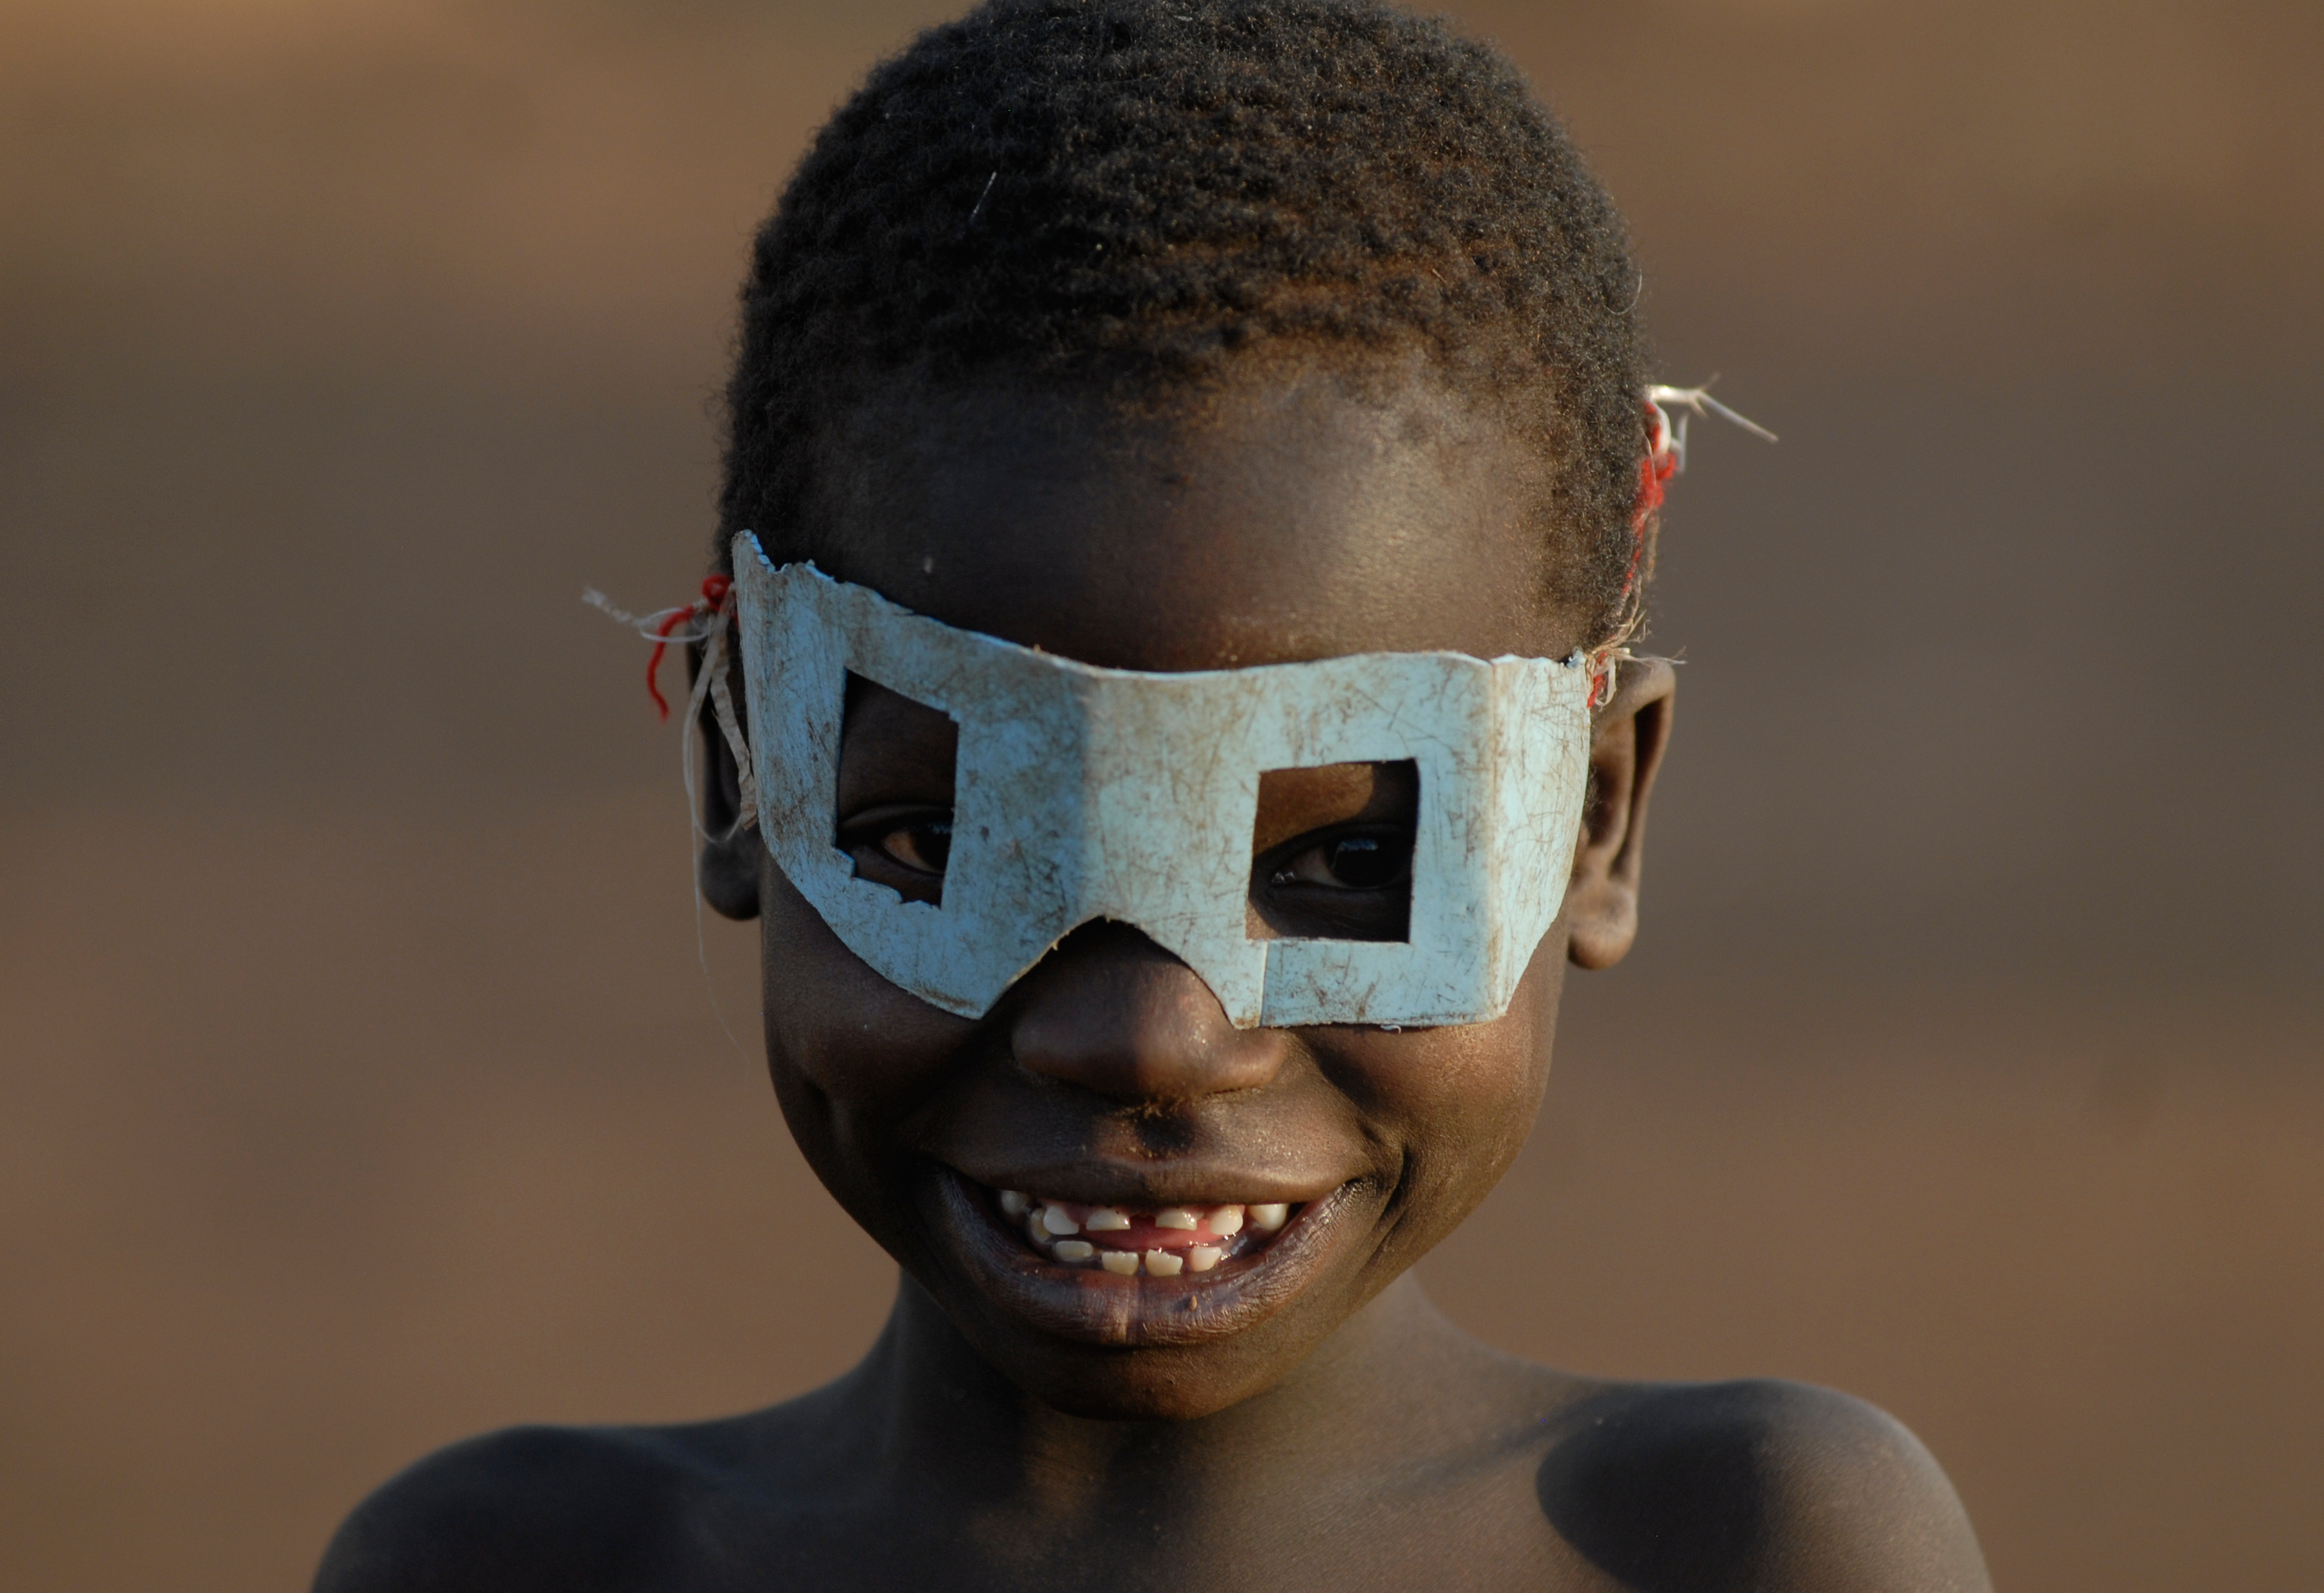 Charity: Salvo's, World Vison, Australian Conservation Foundation